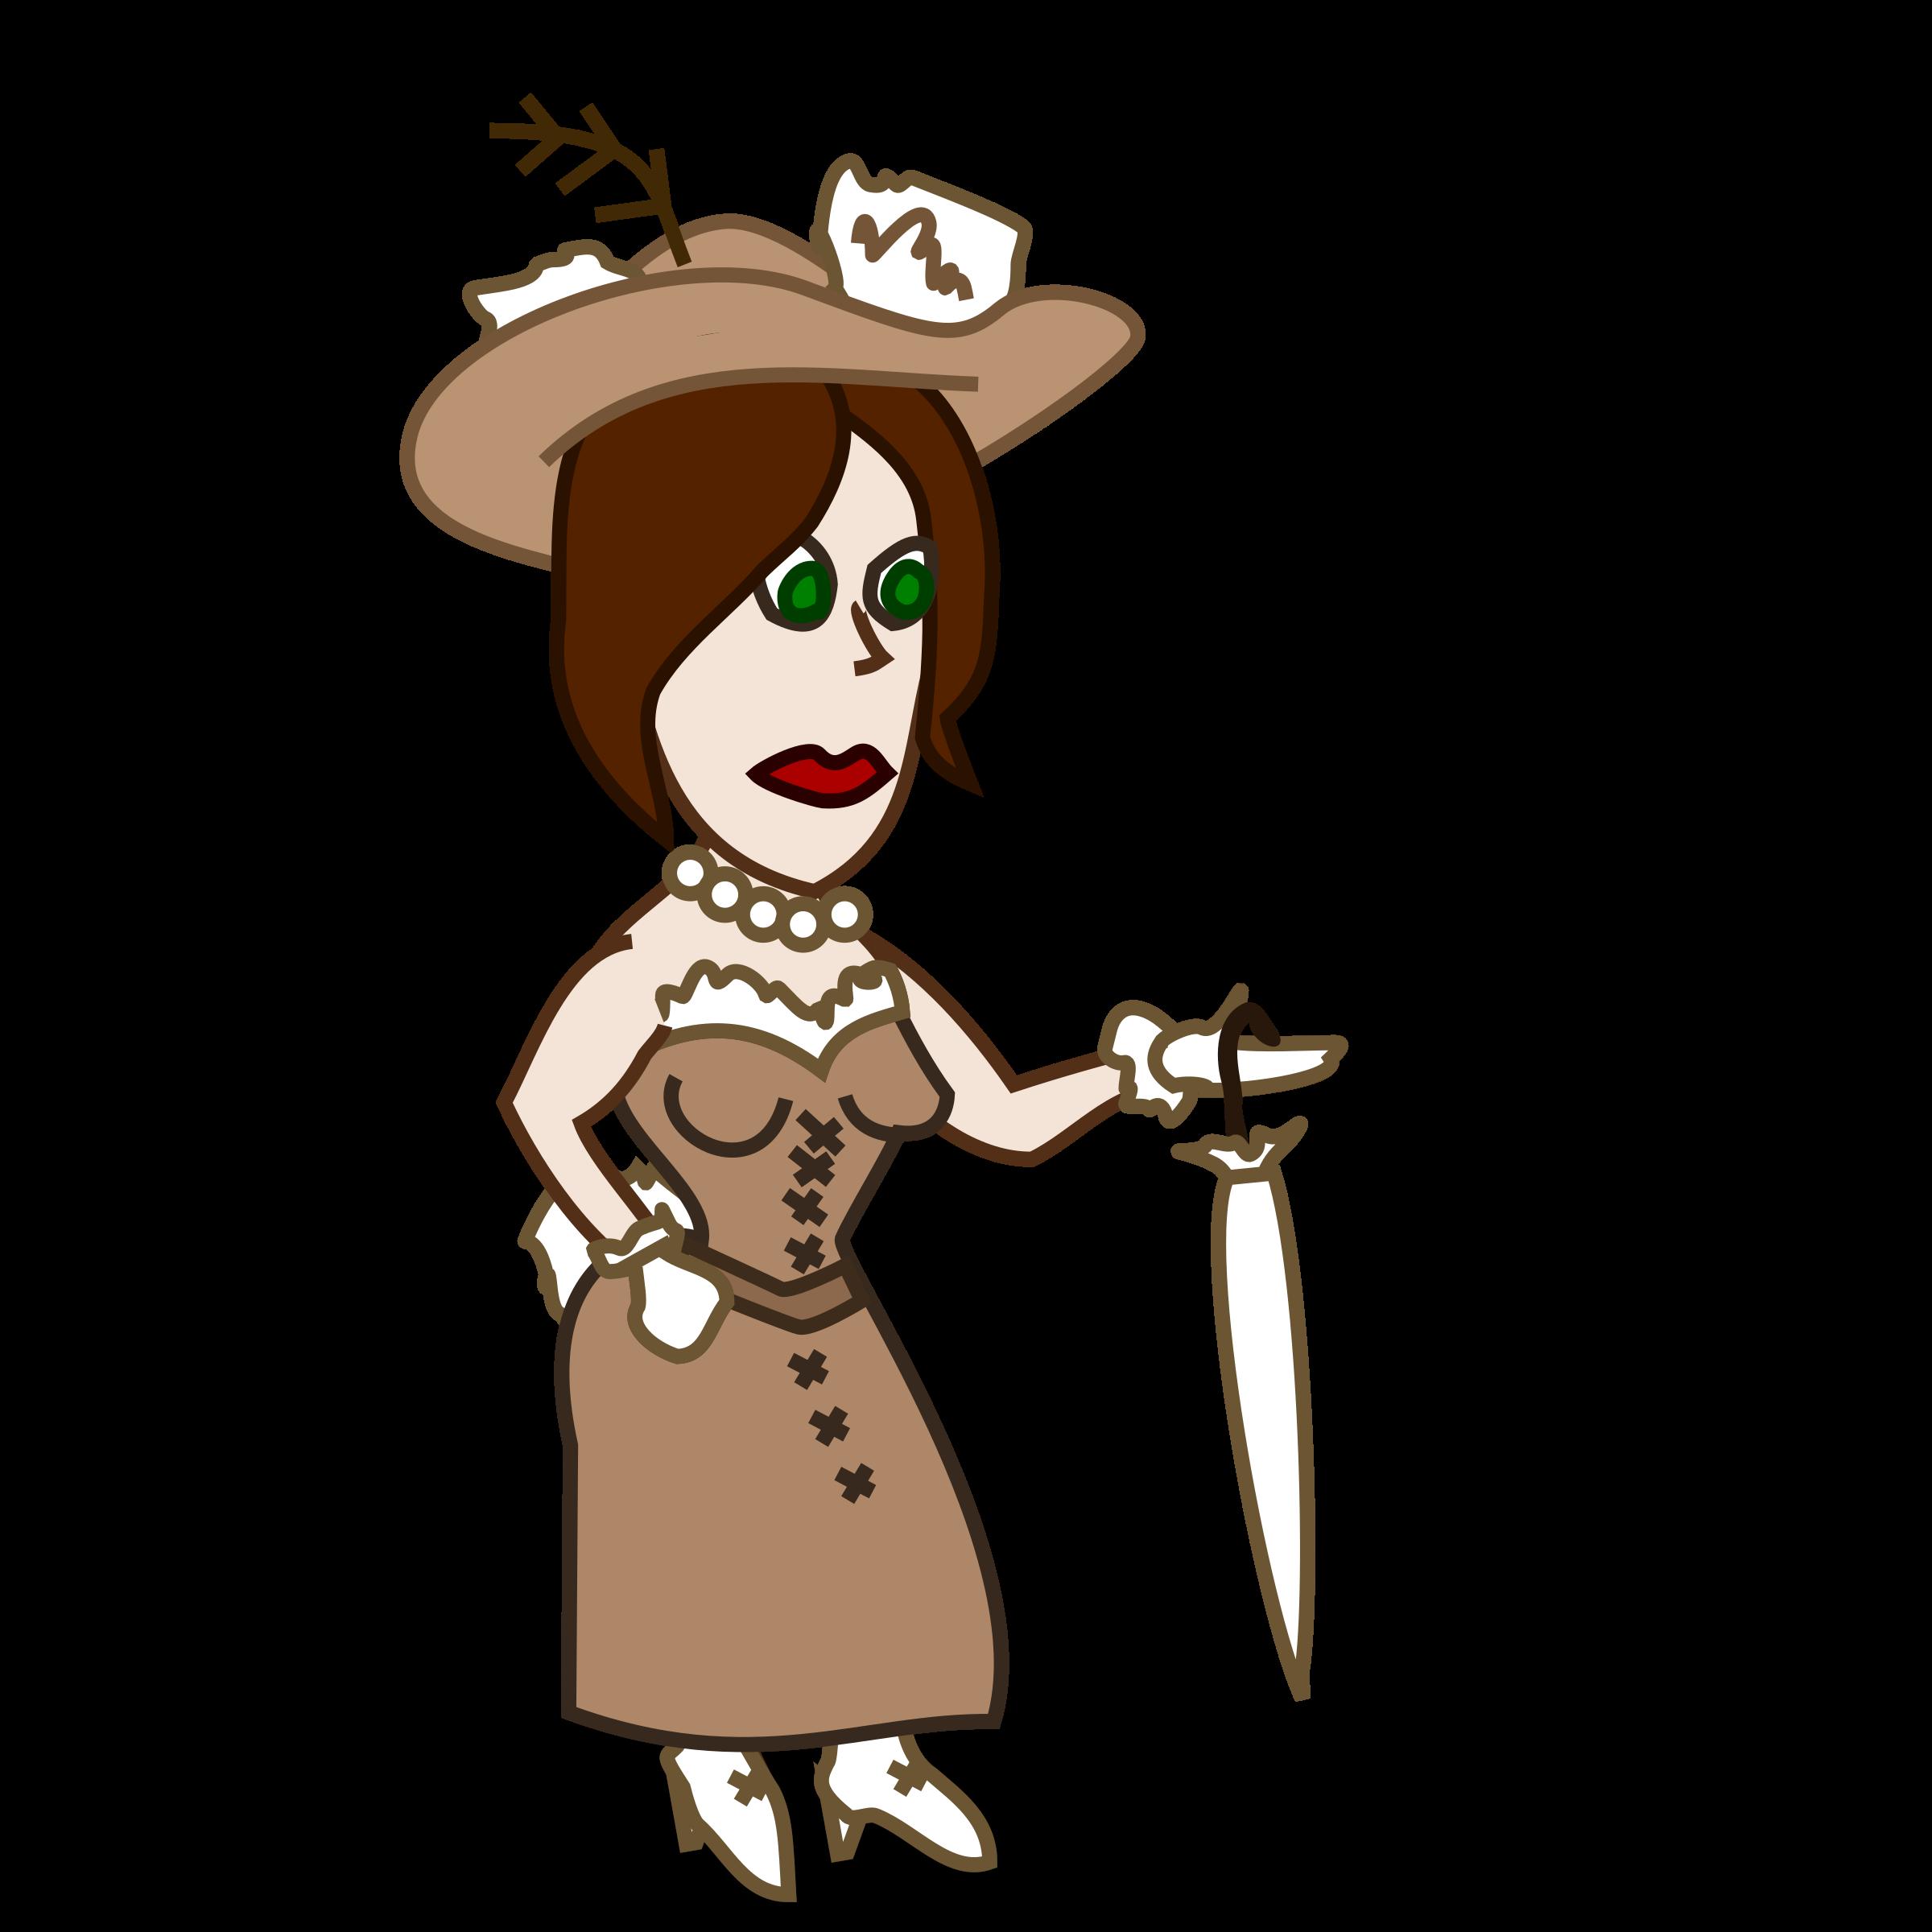 Costume clipart character. Comic characters lady big